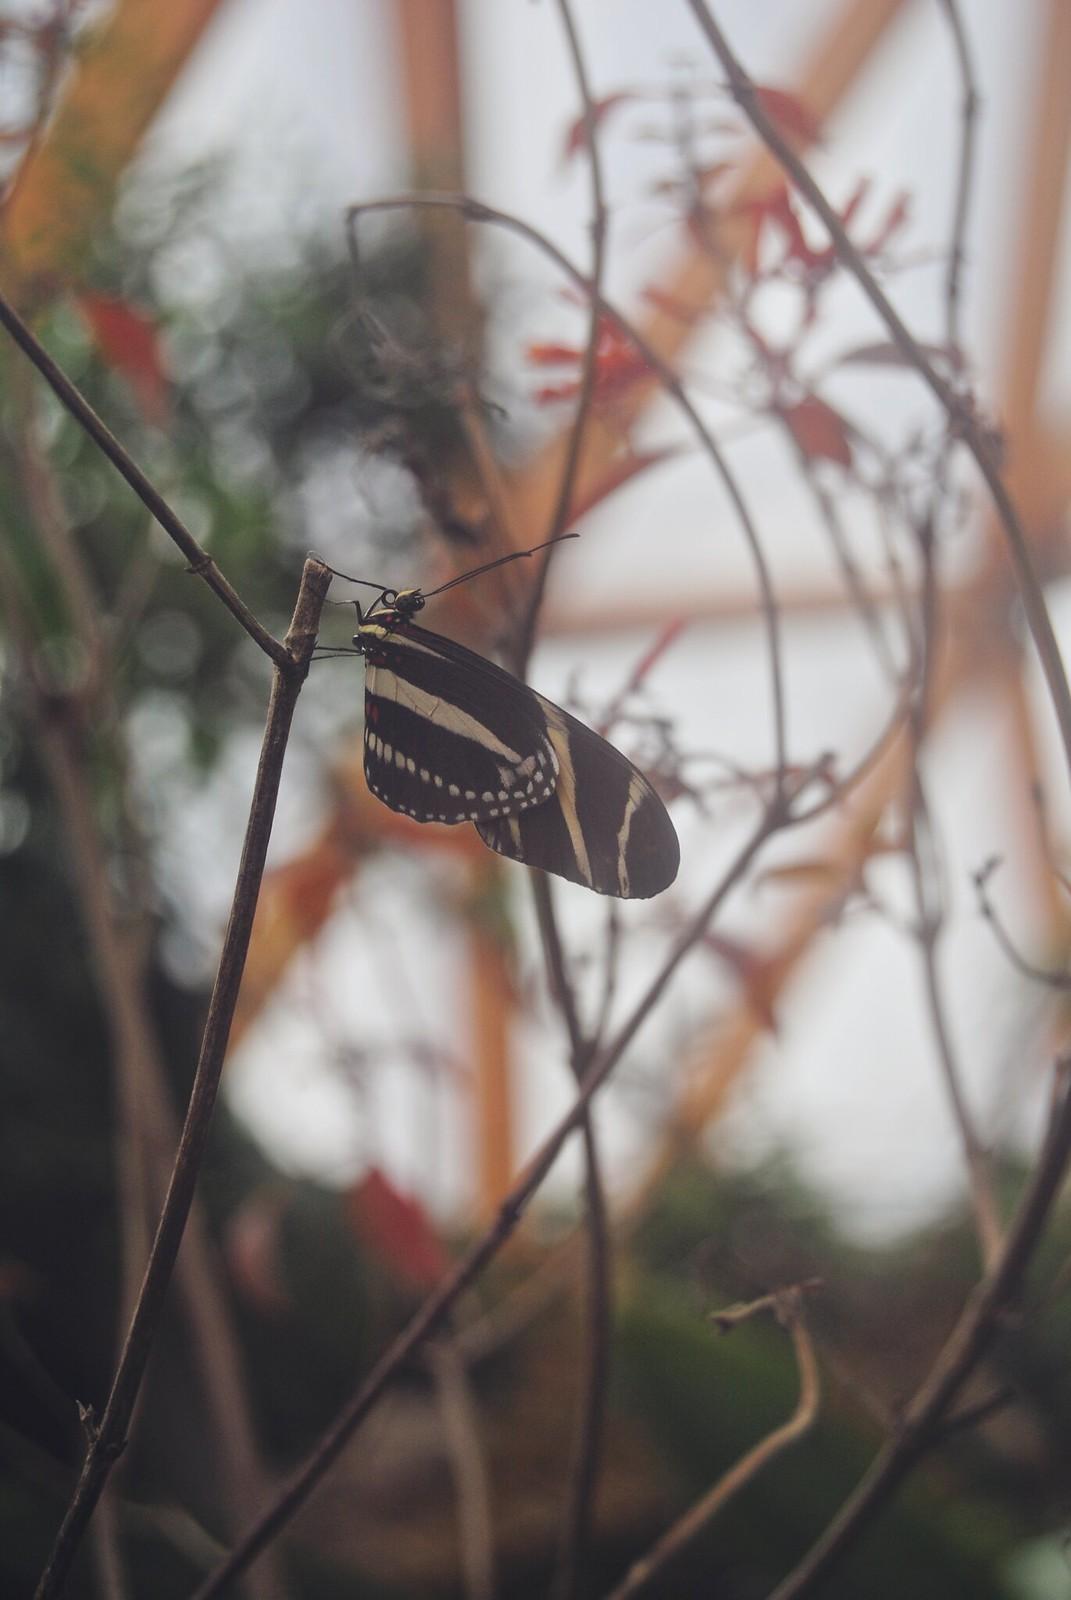 Amazon Butterflies at the Rotterdam Zoo (Blijdorp).